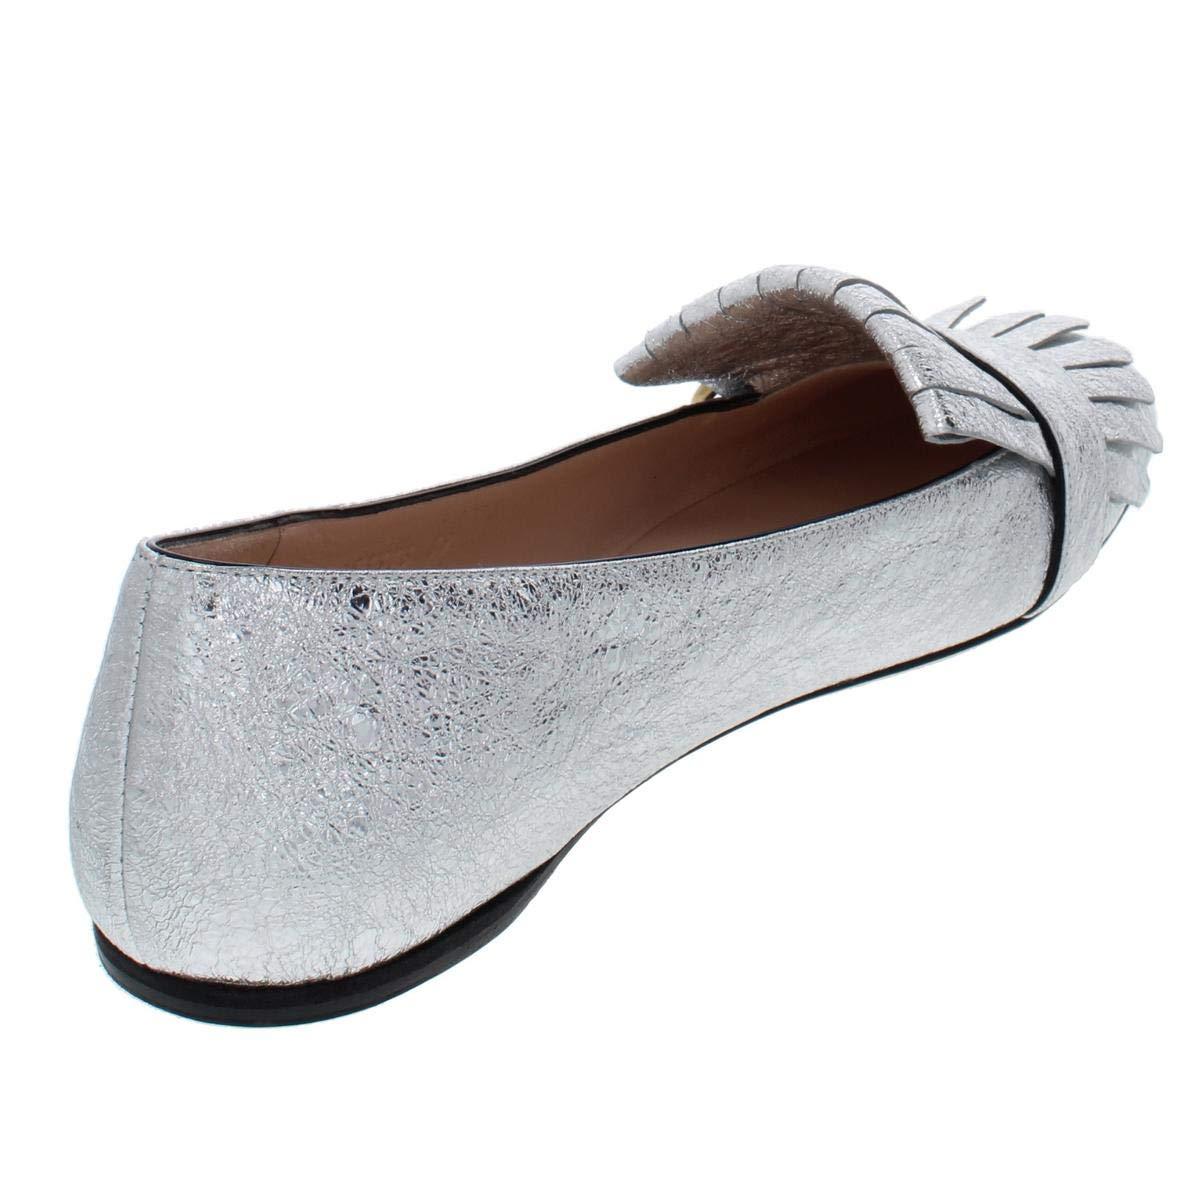 2afd25b9b5b Amazon.com  Gucci Womens Galassia Metallic Leather Ballet Flats Silver 39  Medium (B